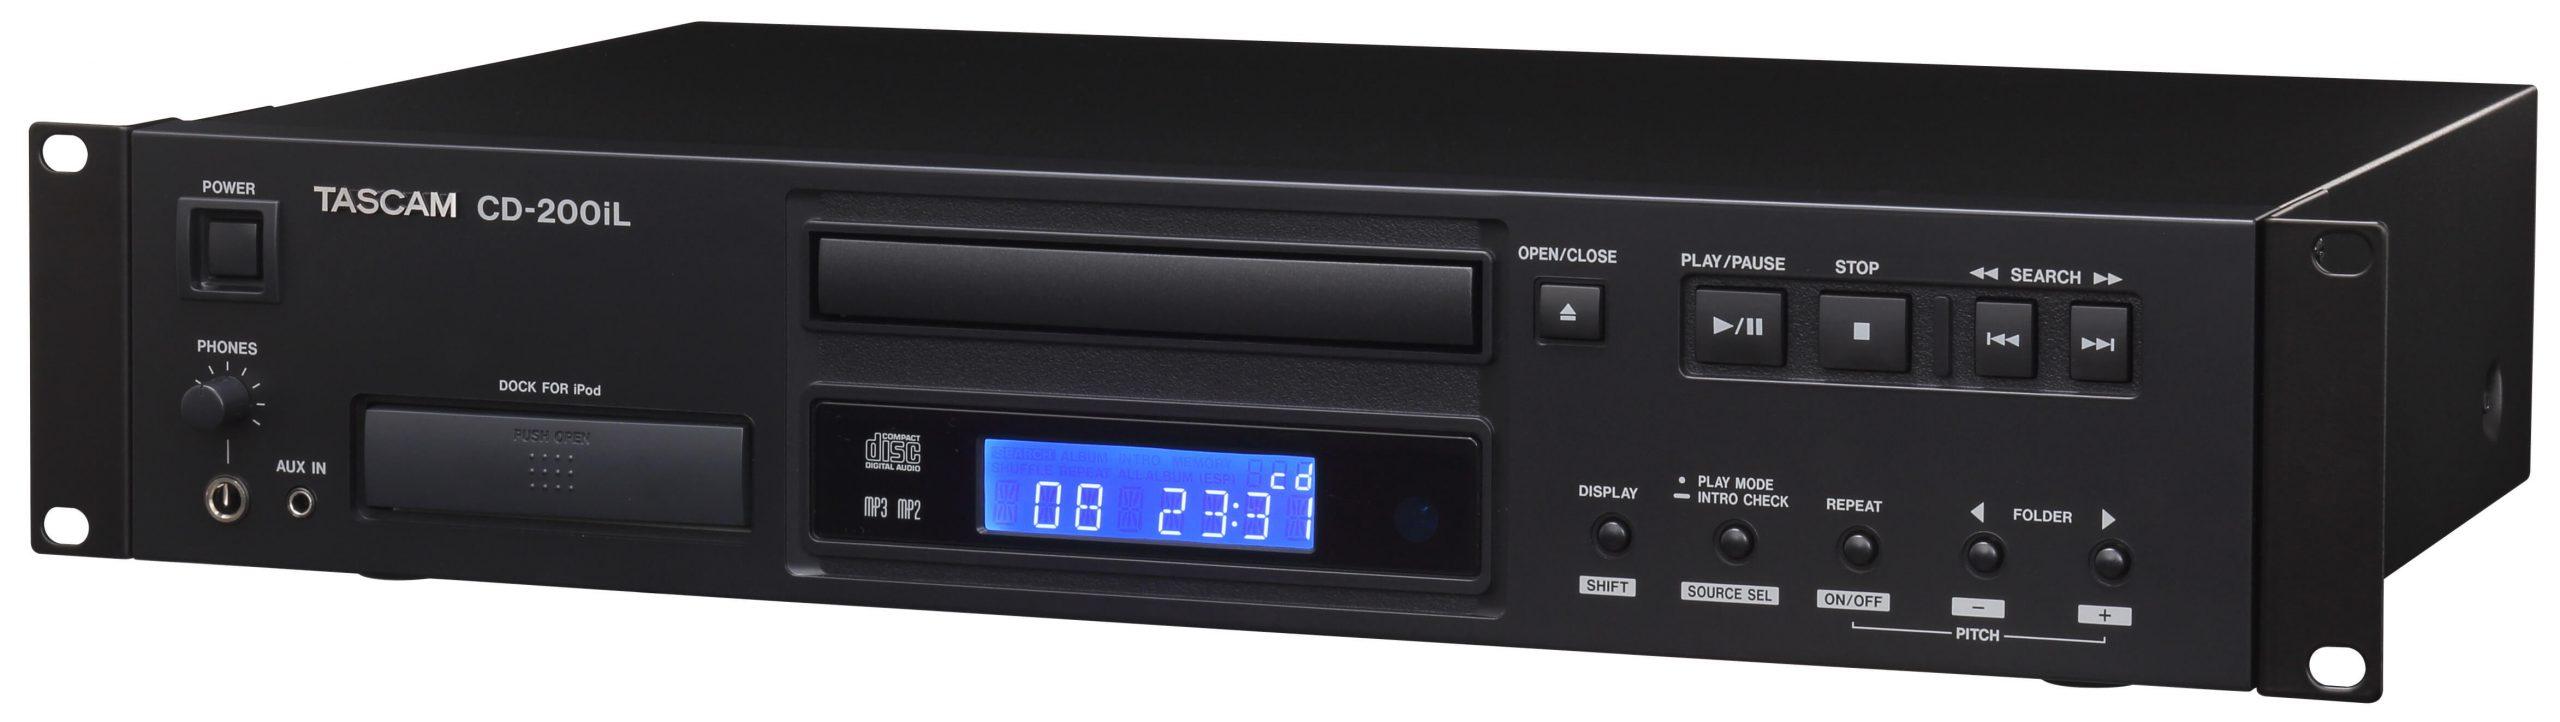 Tascam CD200iL 3